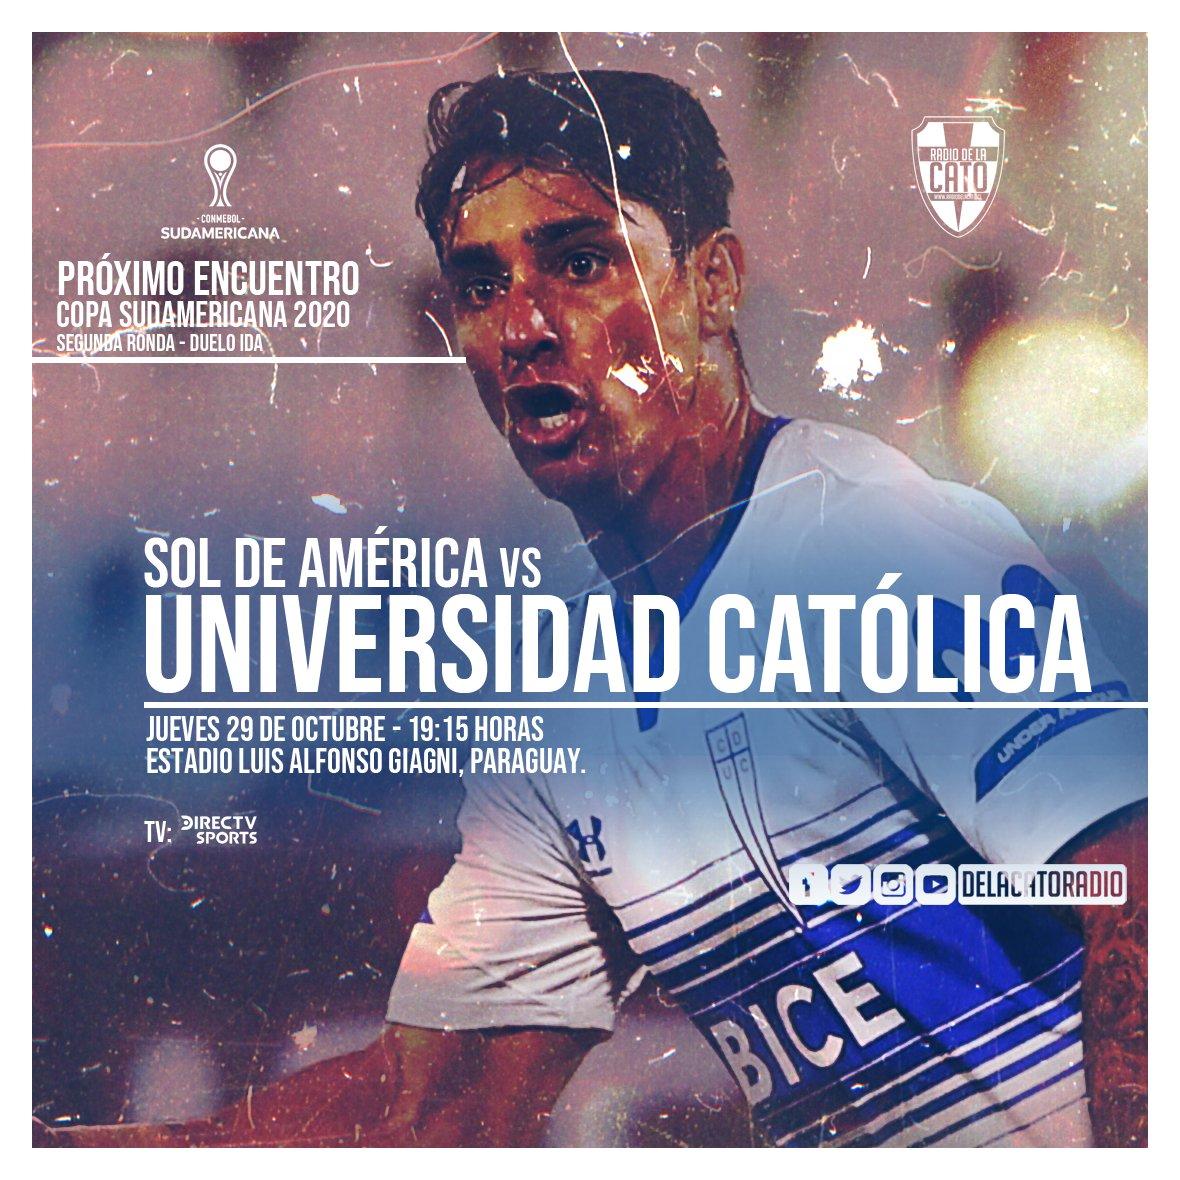 Próximo encuentro: Copa #Sudamericana  2020🏆⚽️ ⏺️segunda Ronda - Ida 🇵🇾Sol de América vs Universidad Católica🇨🇱  🗓️Jueves 29 de octubre ⏰19:15 Horas 🏟️Luis Giagni, Paraguay 📺DirectvSports  #LosCruzados https://t.co/zMwidr9a2Y